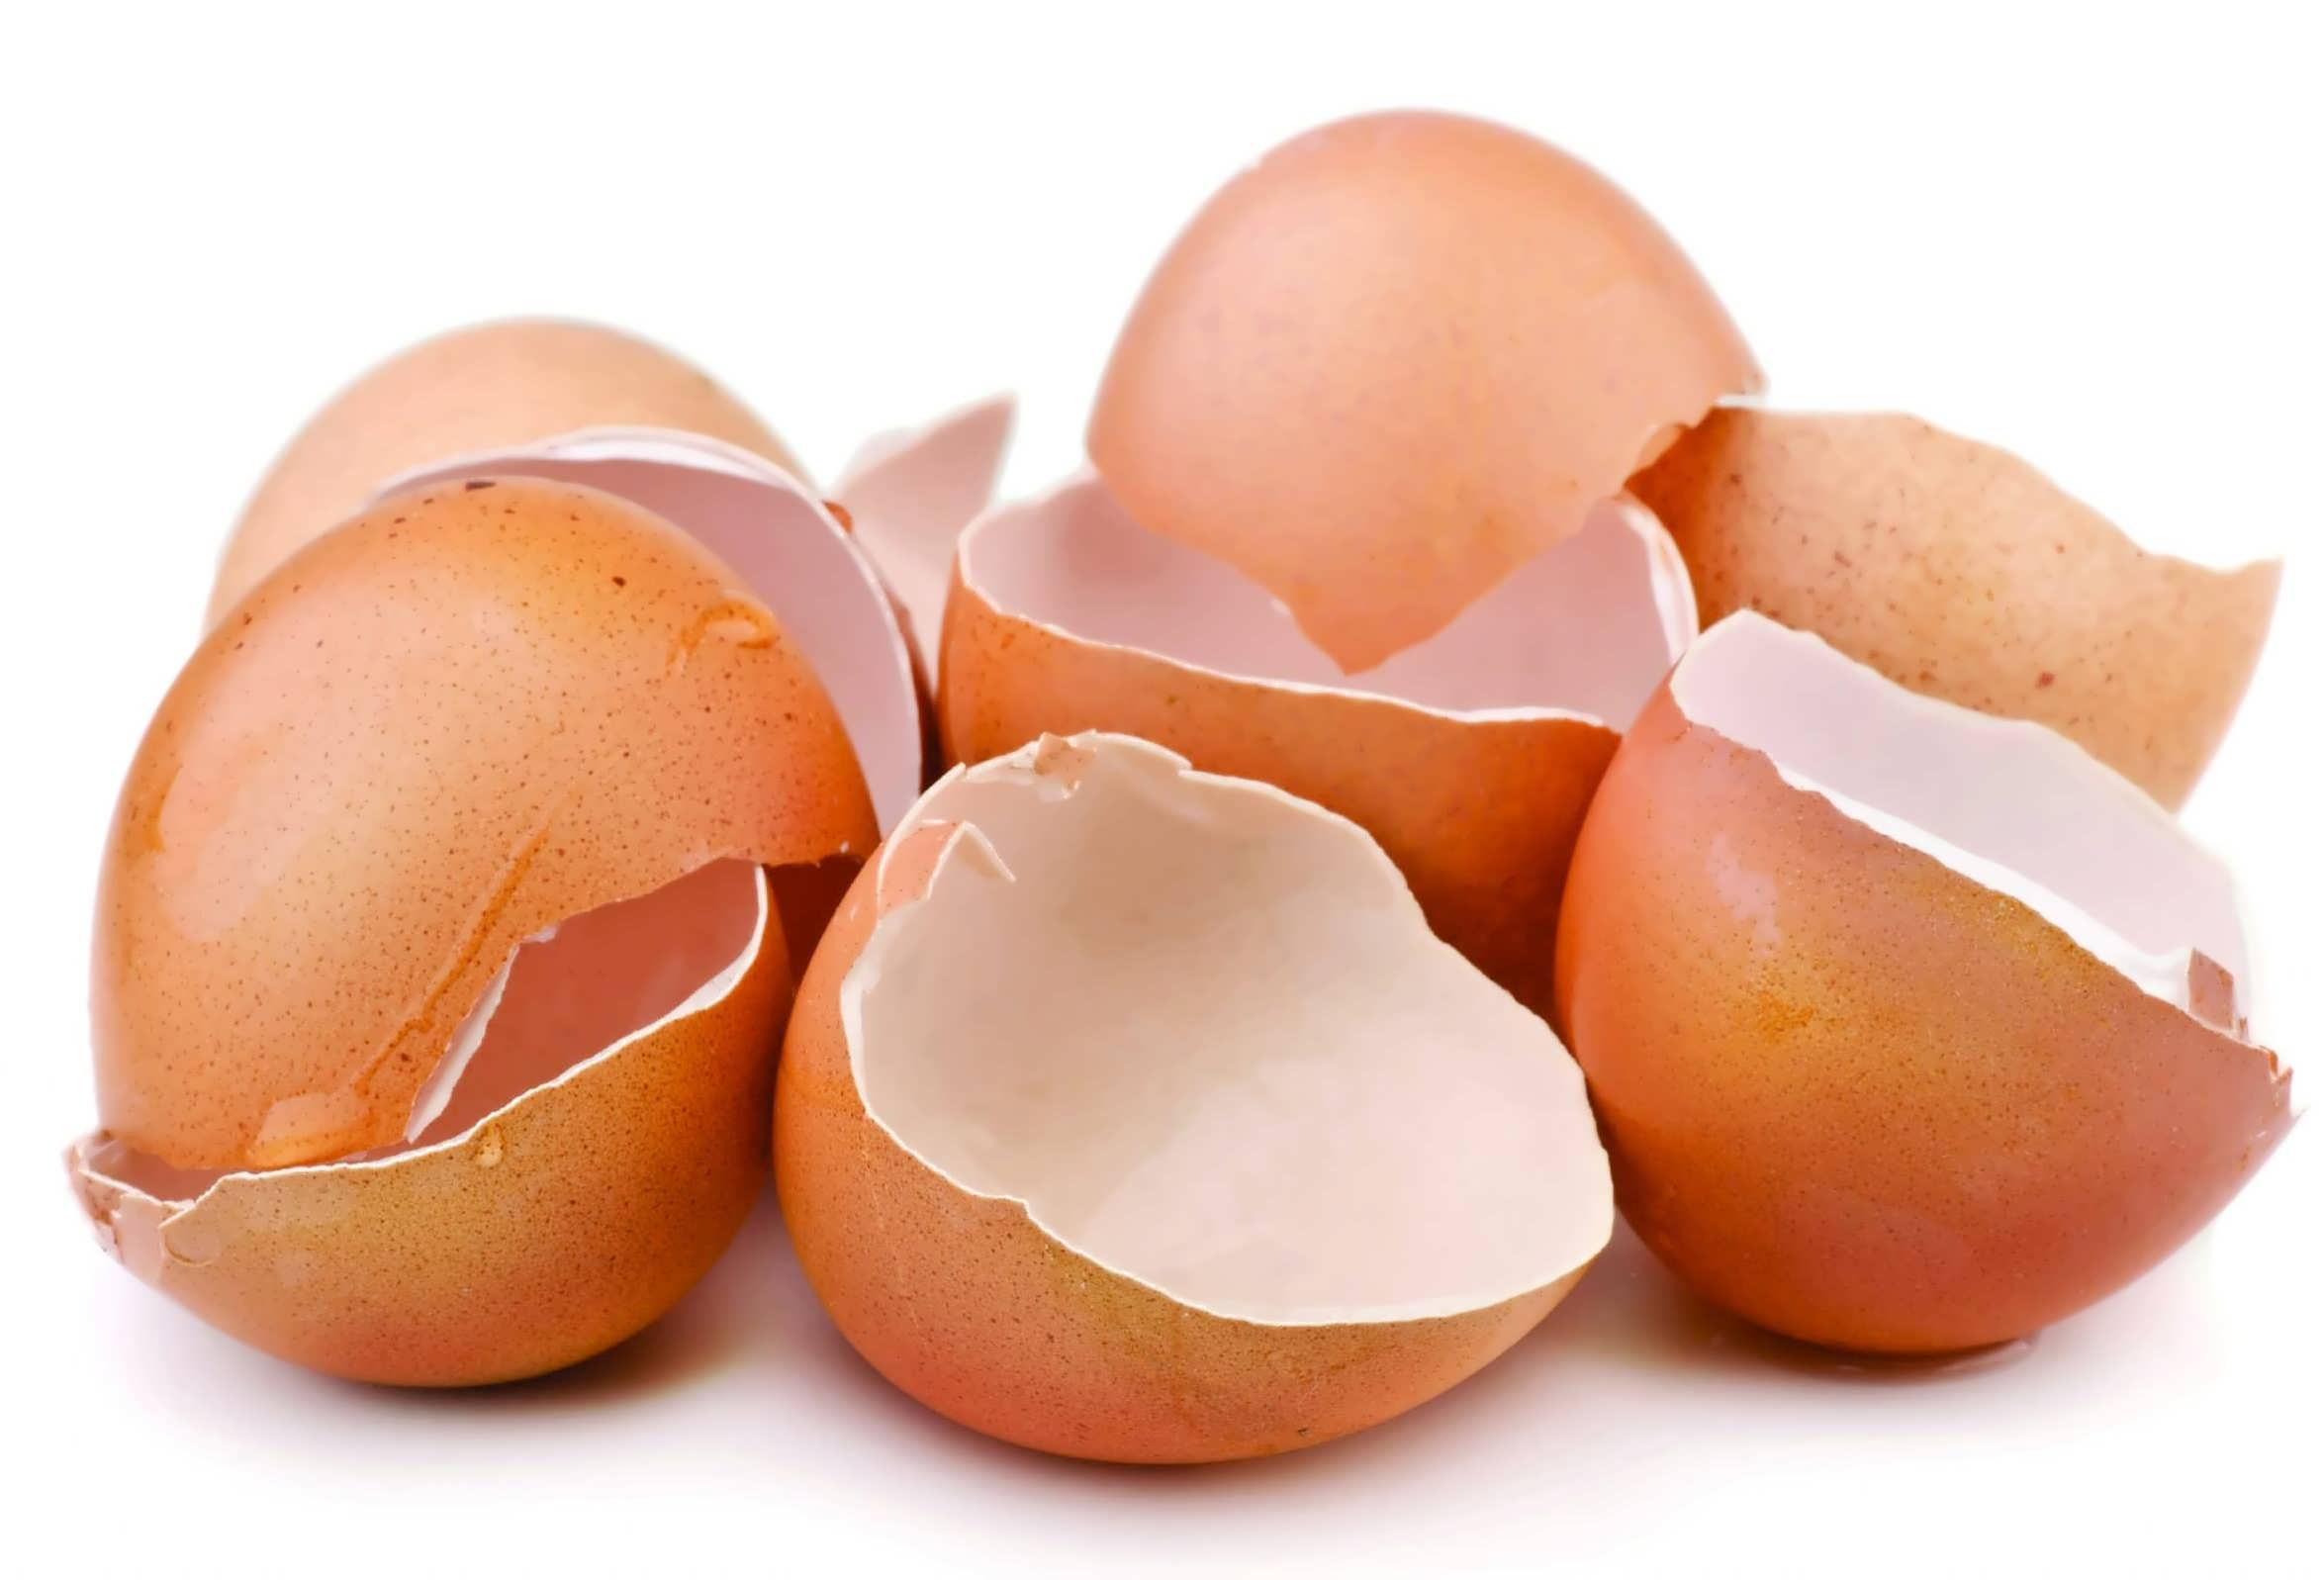 خواص مختلف پوست تخم مرغ